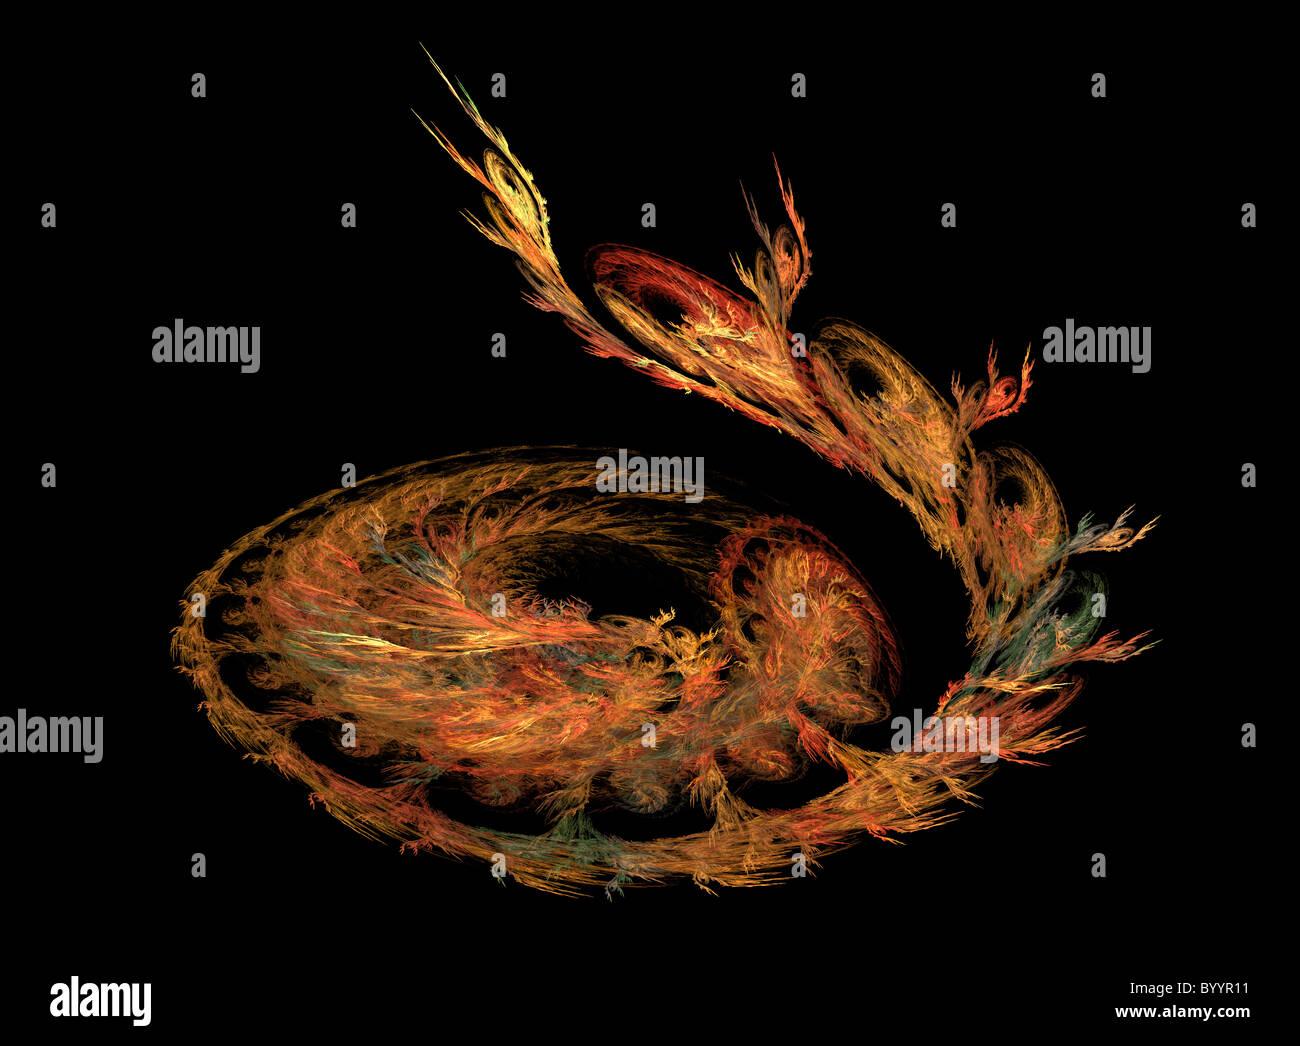 A Fractal Image Entitled A Serpents Vine Stock Photo